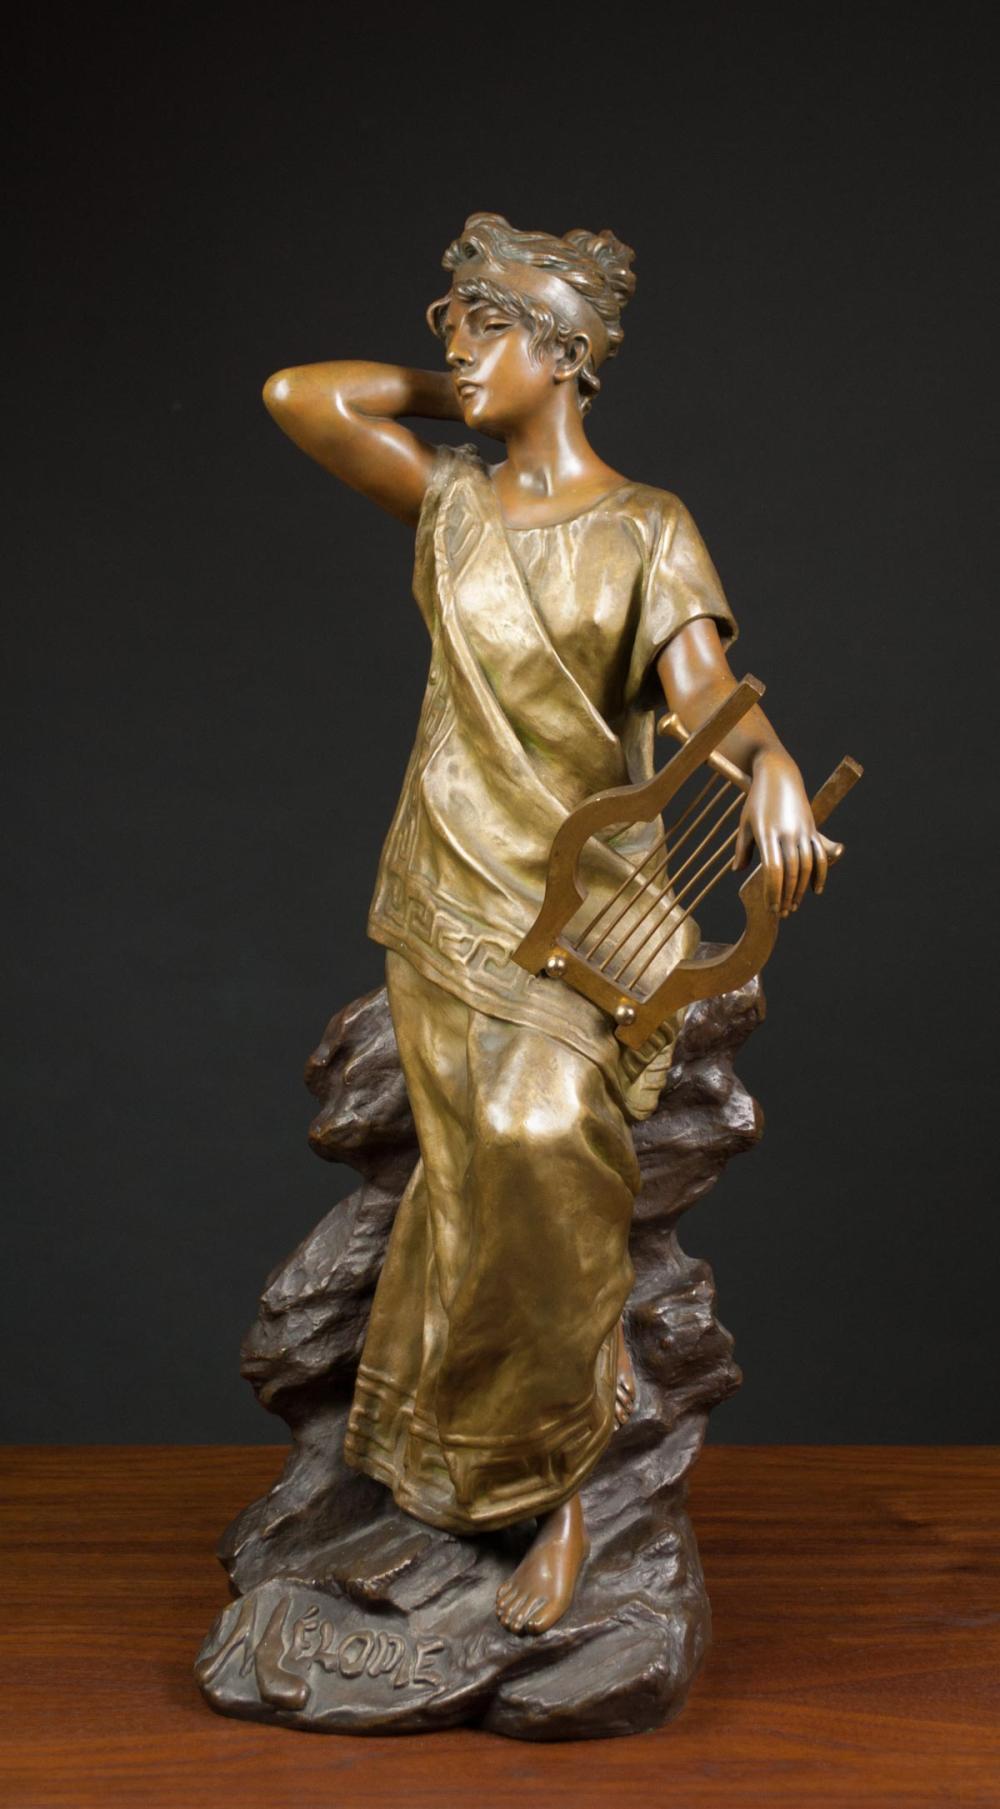 EMMANUEL VILLANIS (France, 1858-1914) bronze sculp